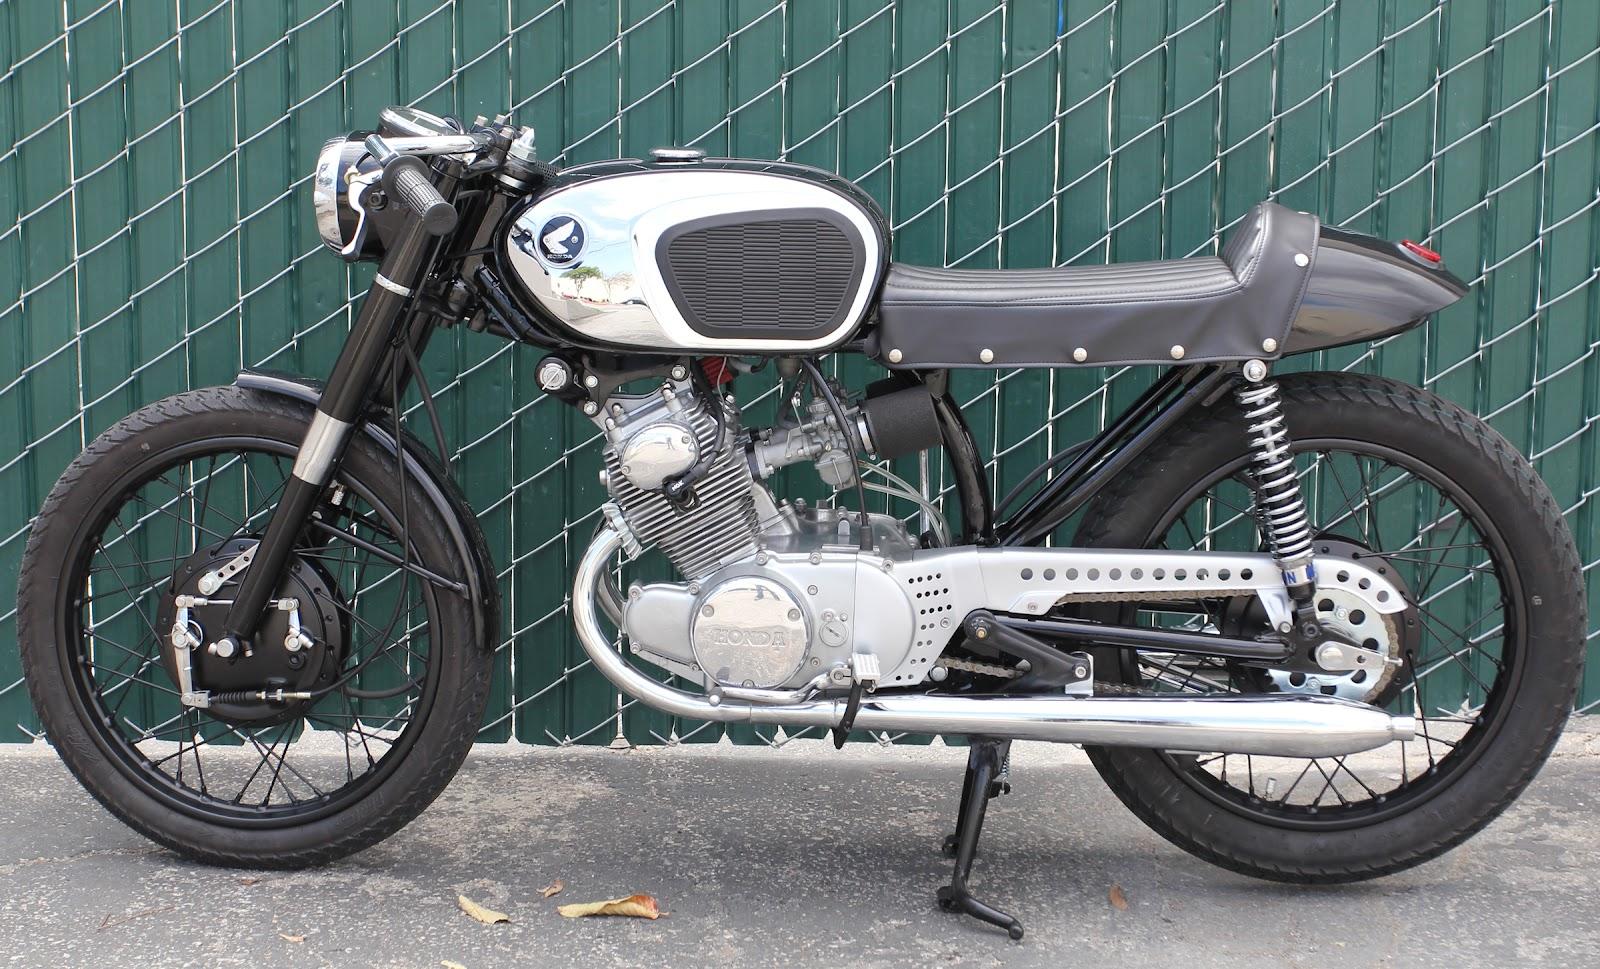 Milchapitas Kustom Bikes Honda CB160 1965 By Lossa